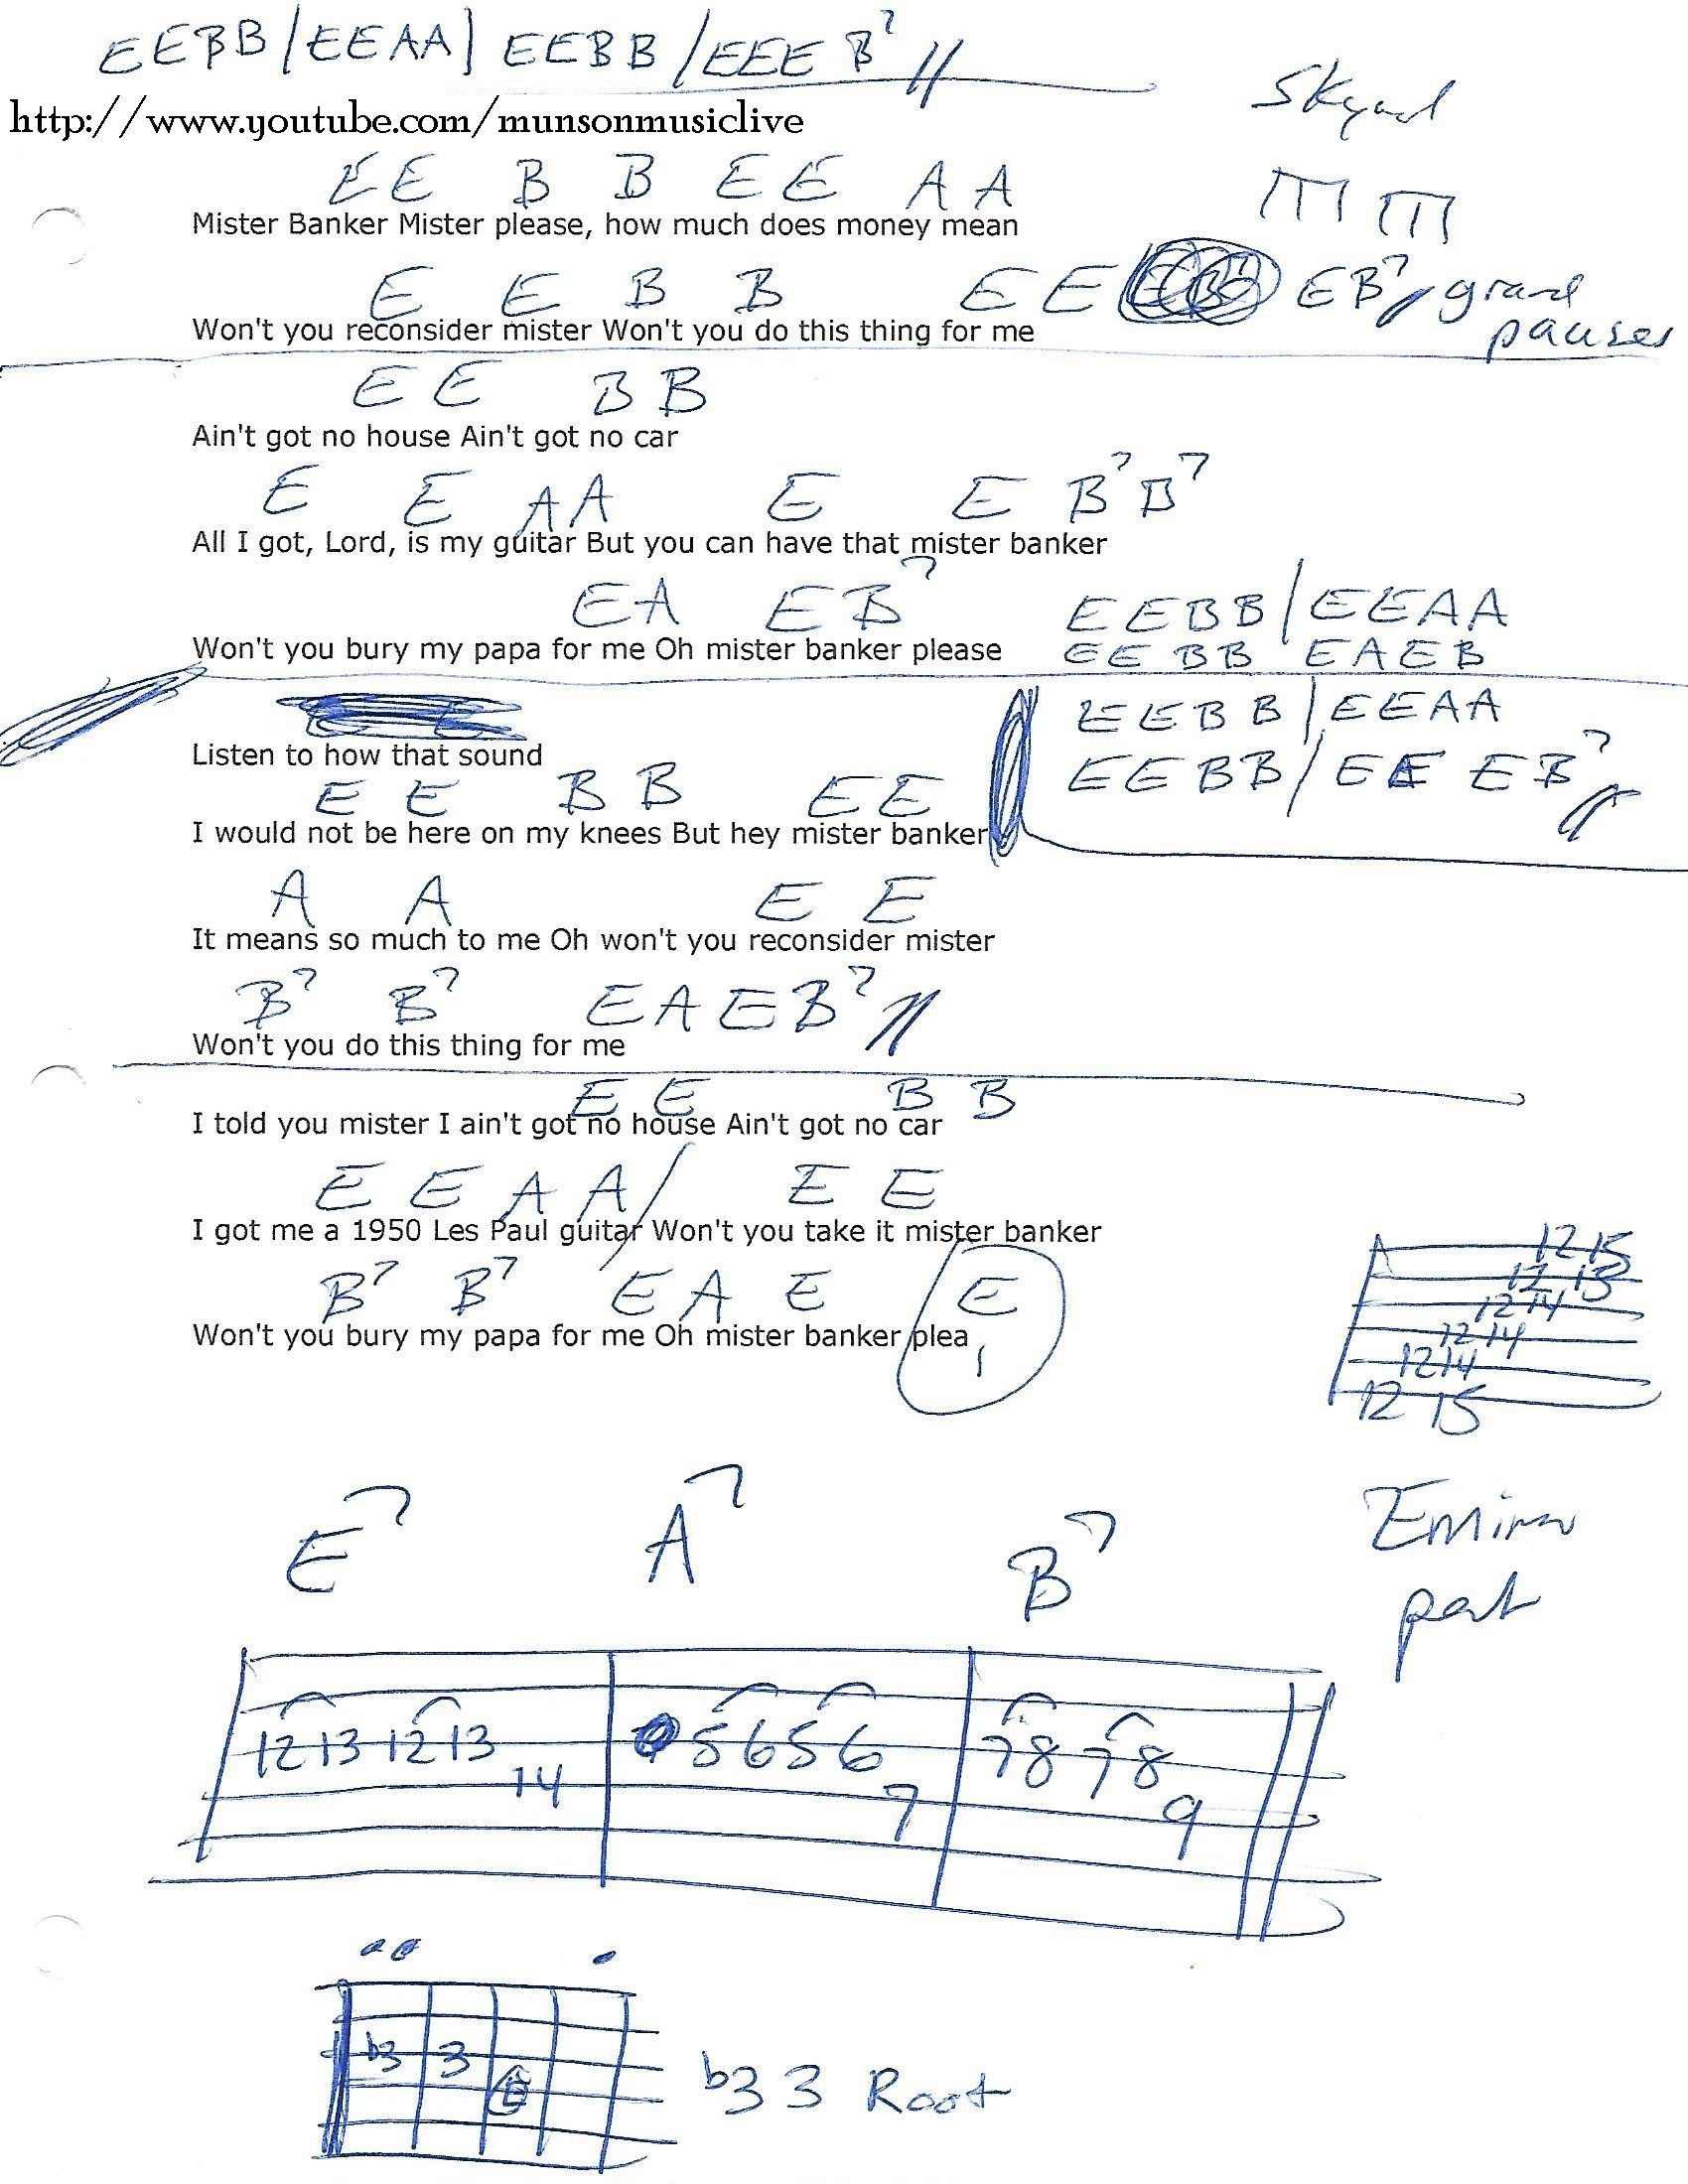 Mr Banker Lynyrd Skynyrd Guitar Chord Chart Guitar Lesson Chord